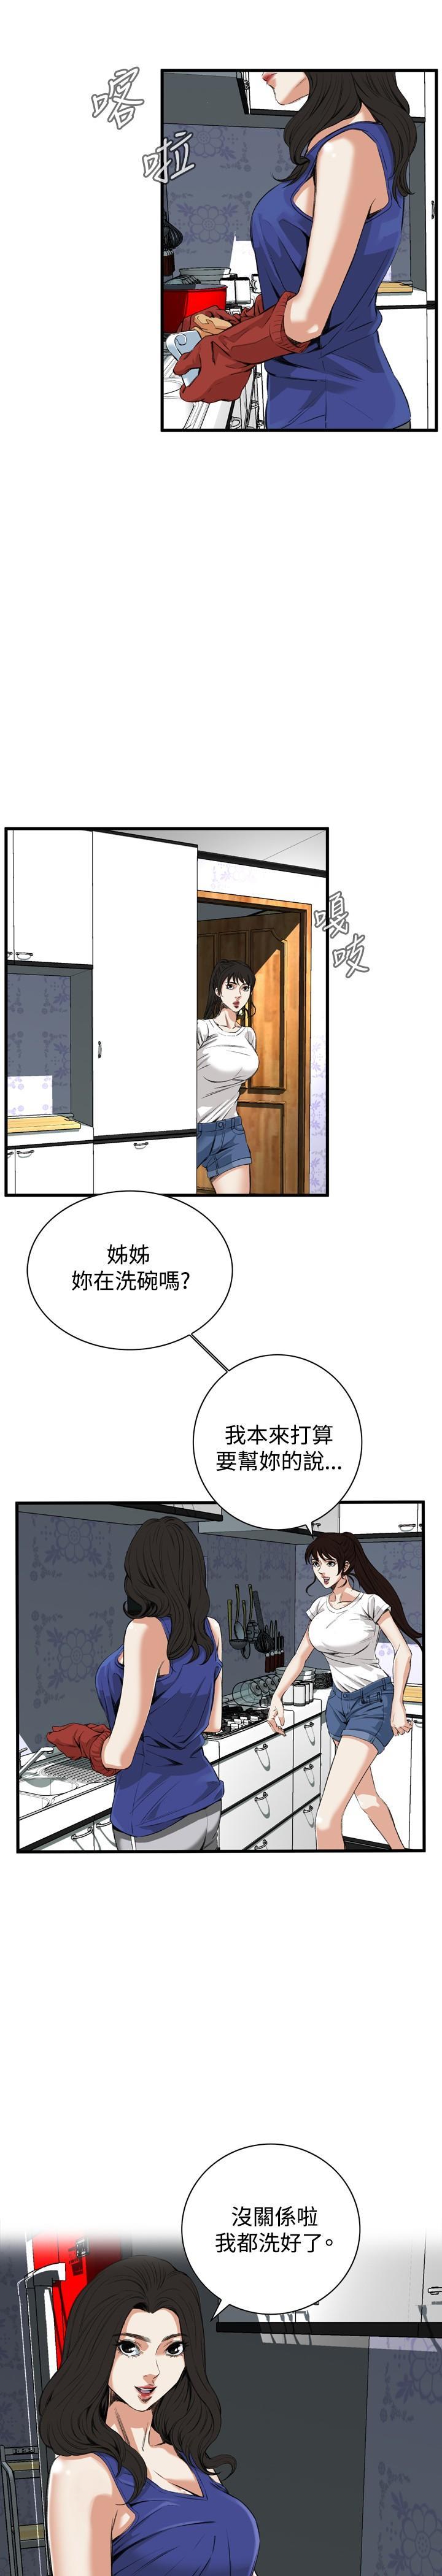 Take a Peek 偷窥 Ch.39~60 [Chinese]中文 211